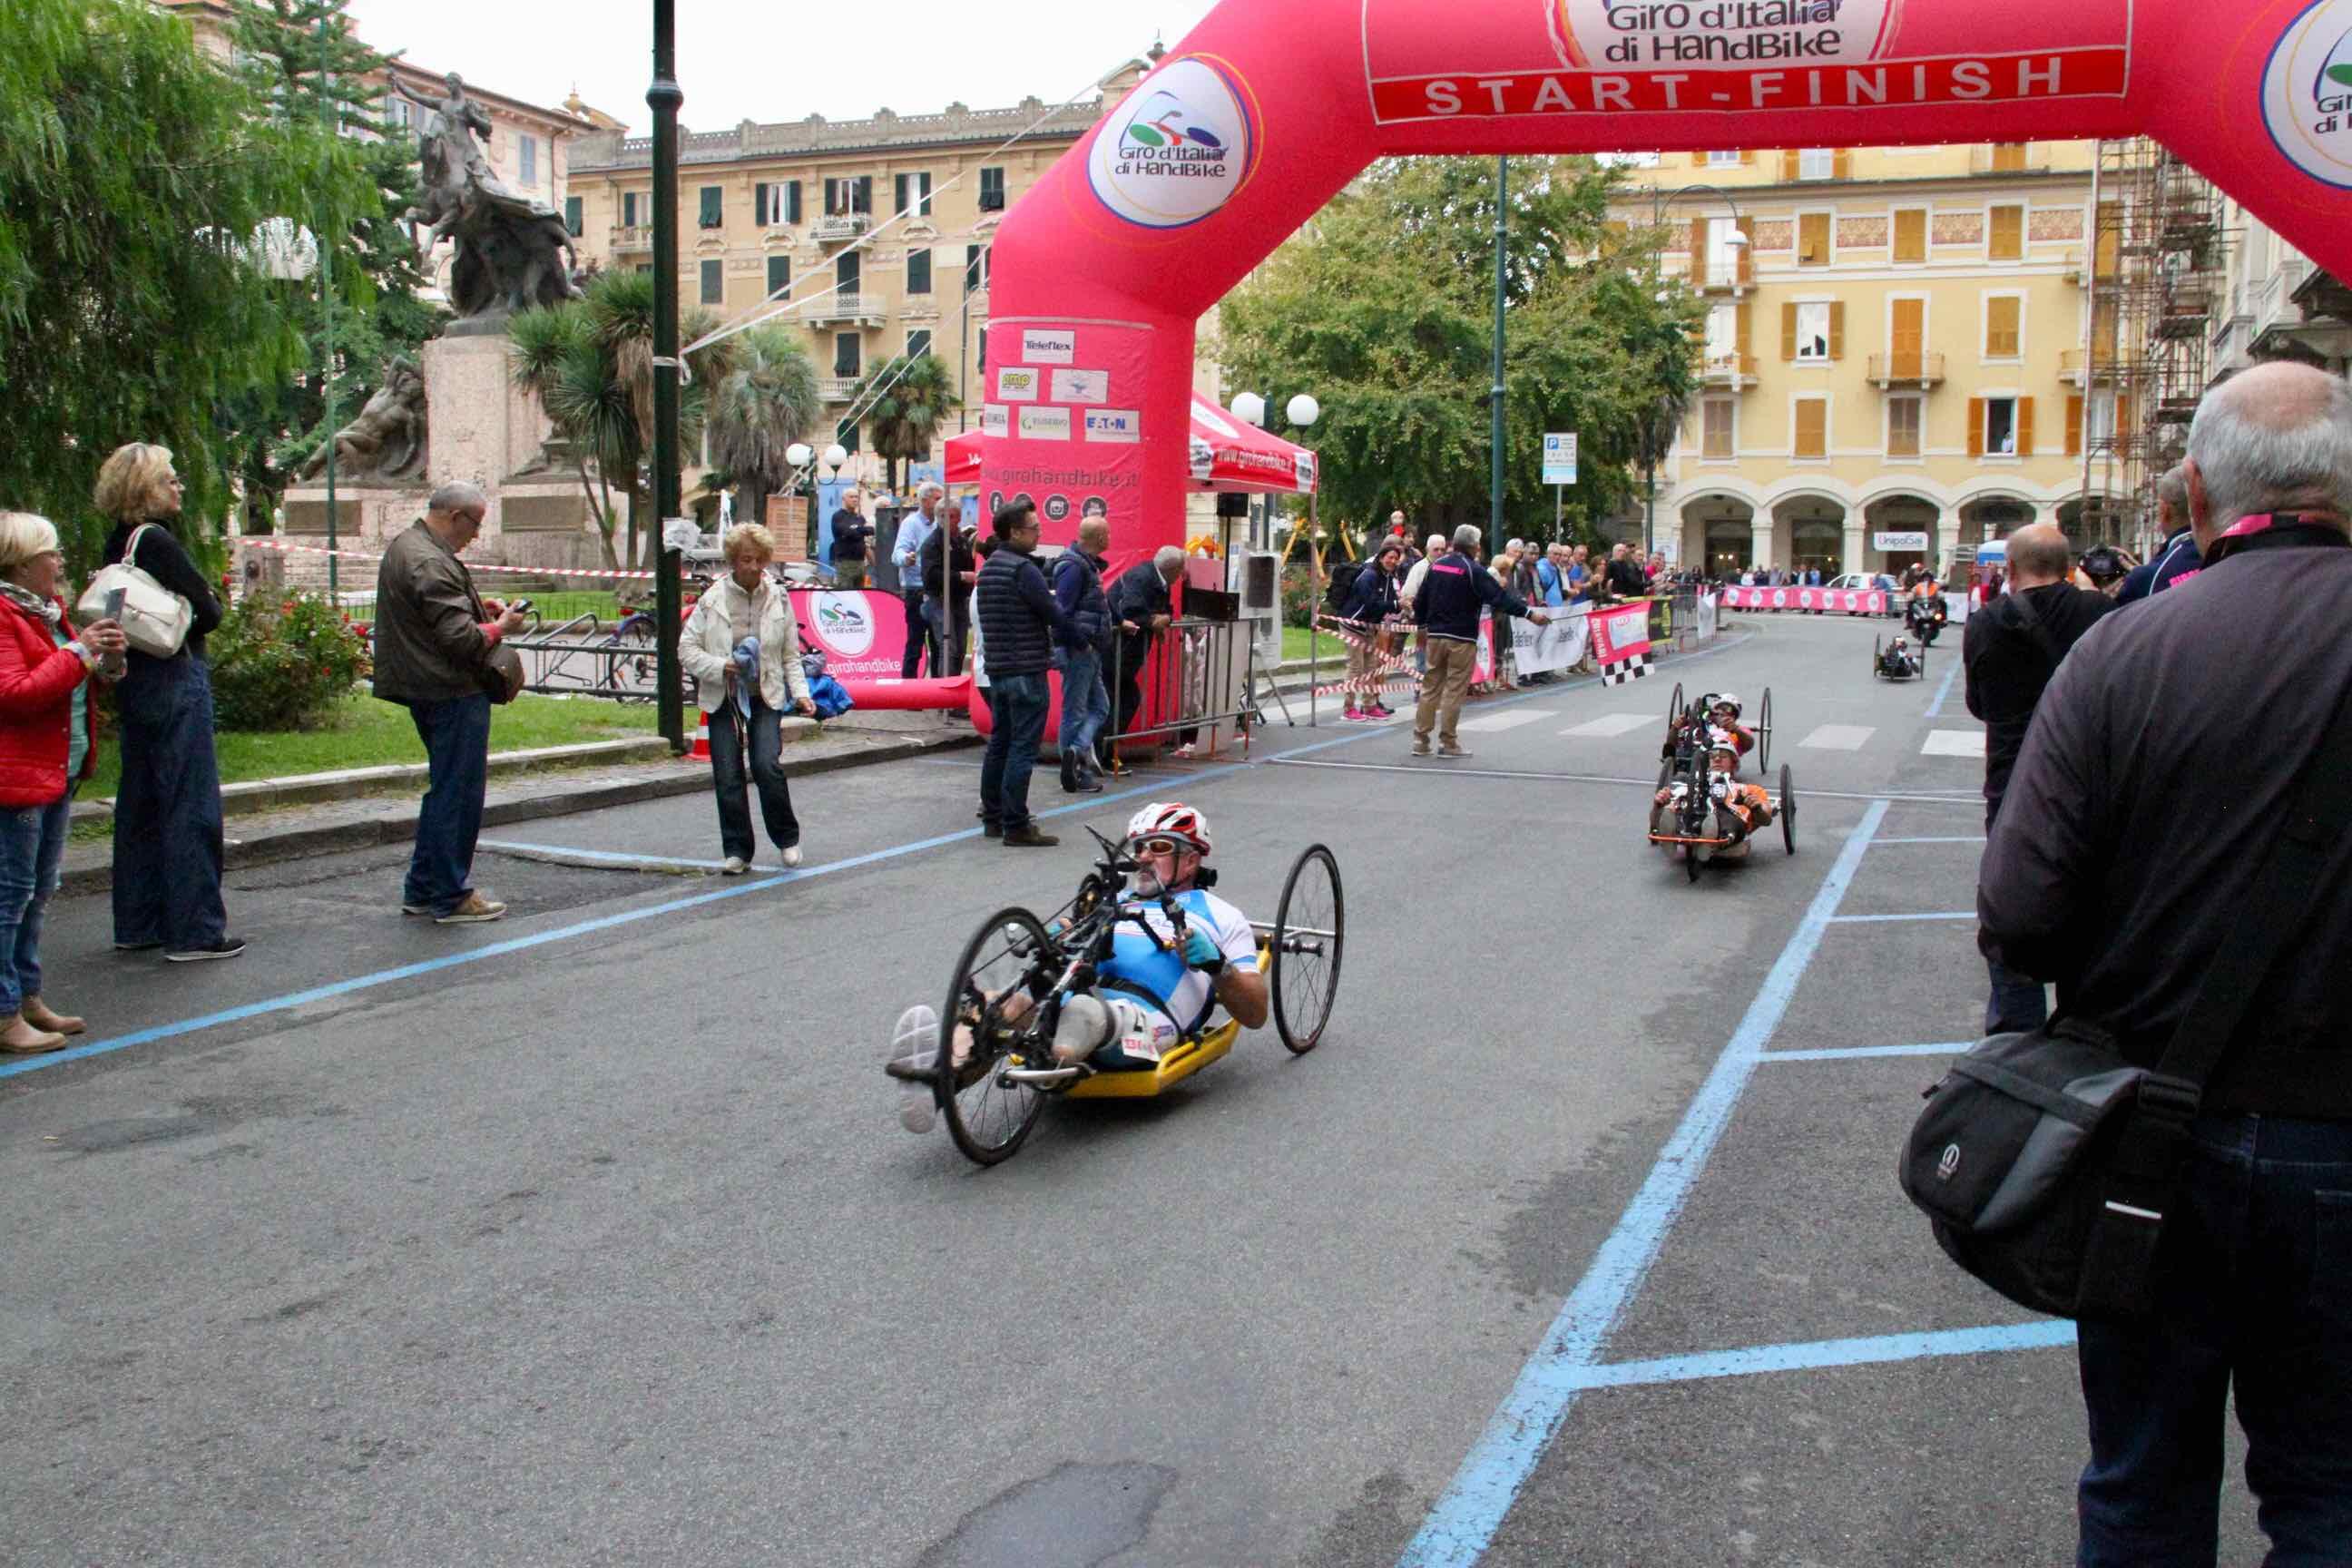 1° Memorial don Nando Negri a Chiavari per il Giro d'Italia Handbike 2018 - 9